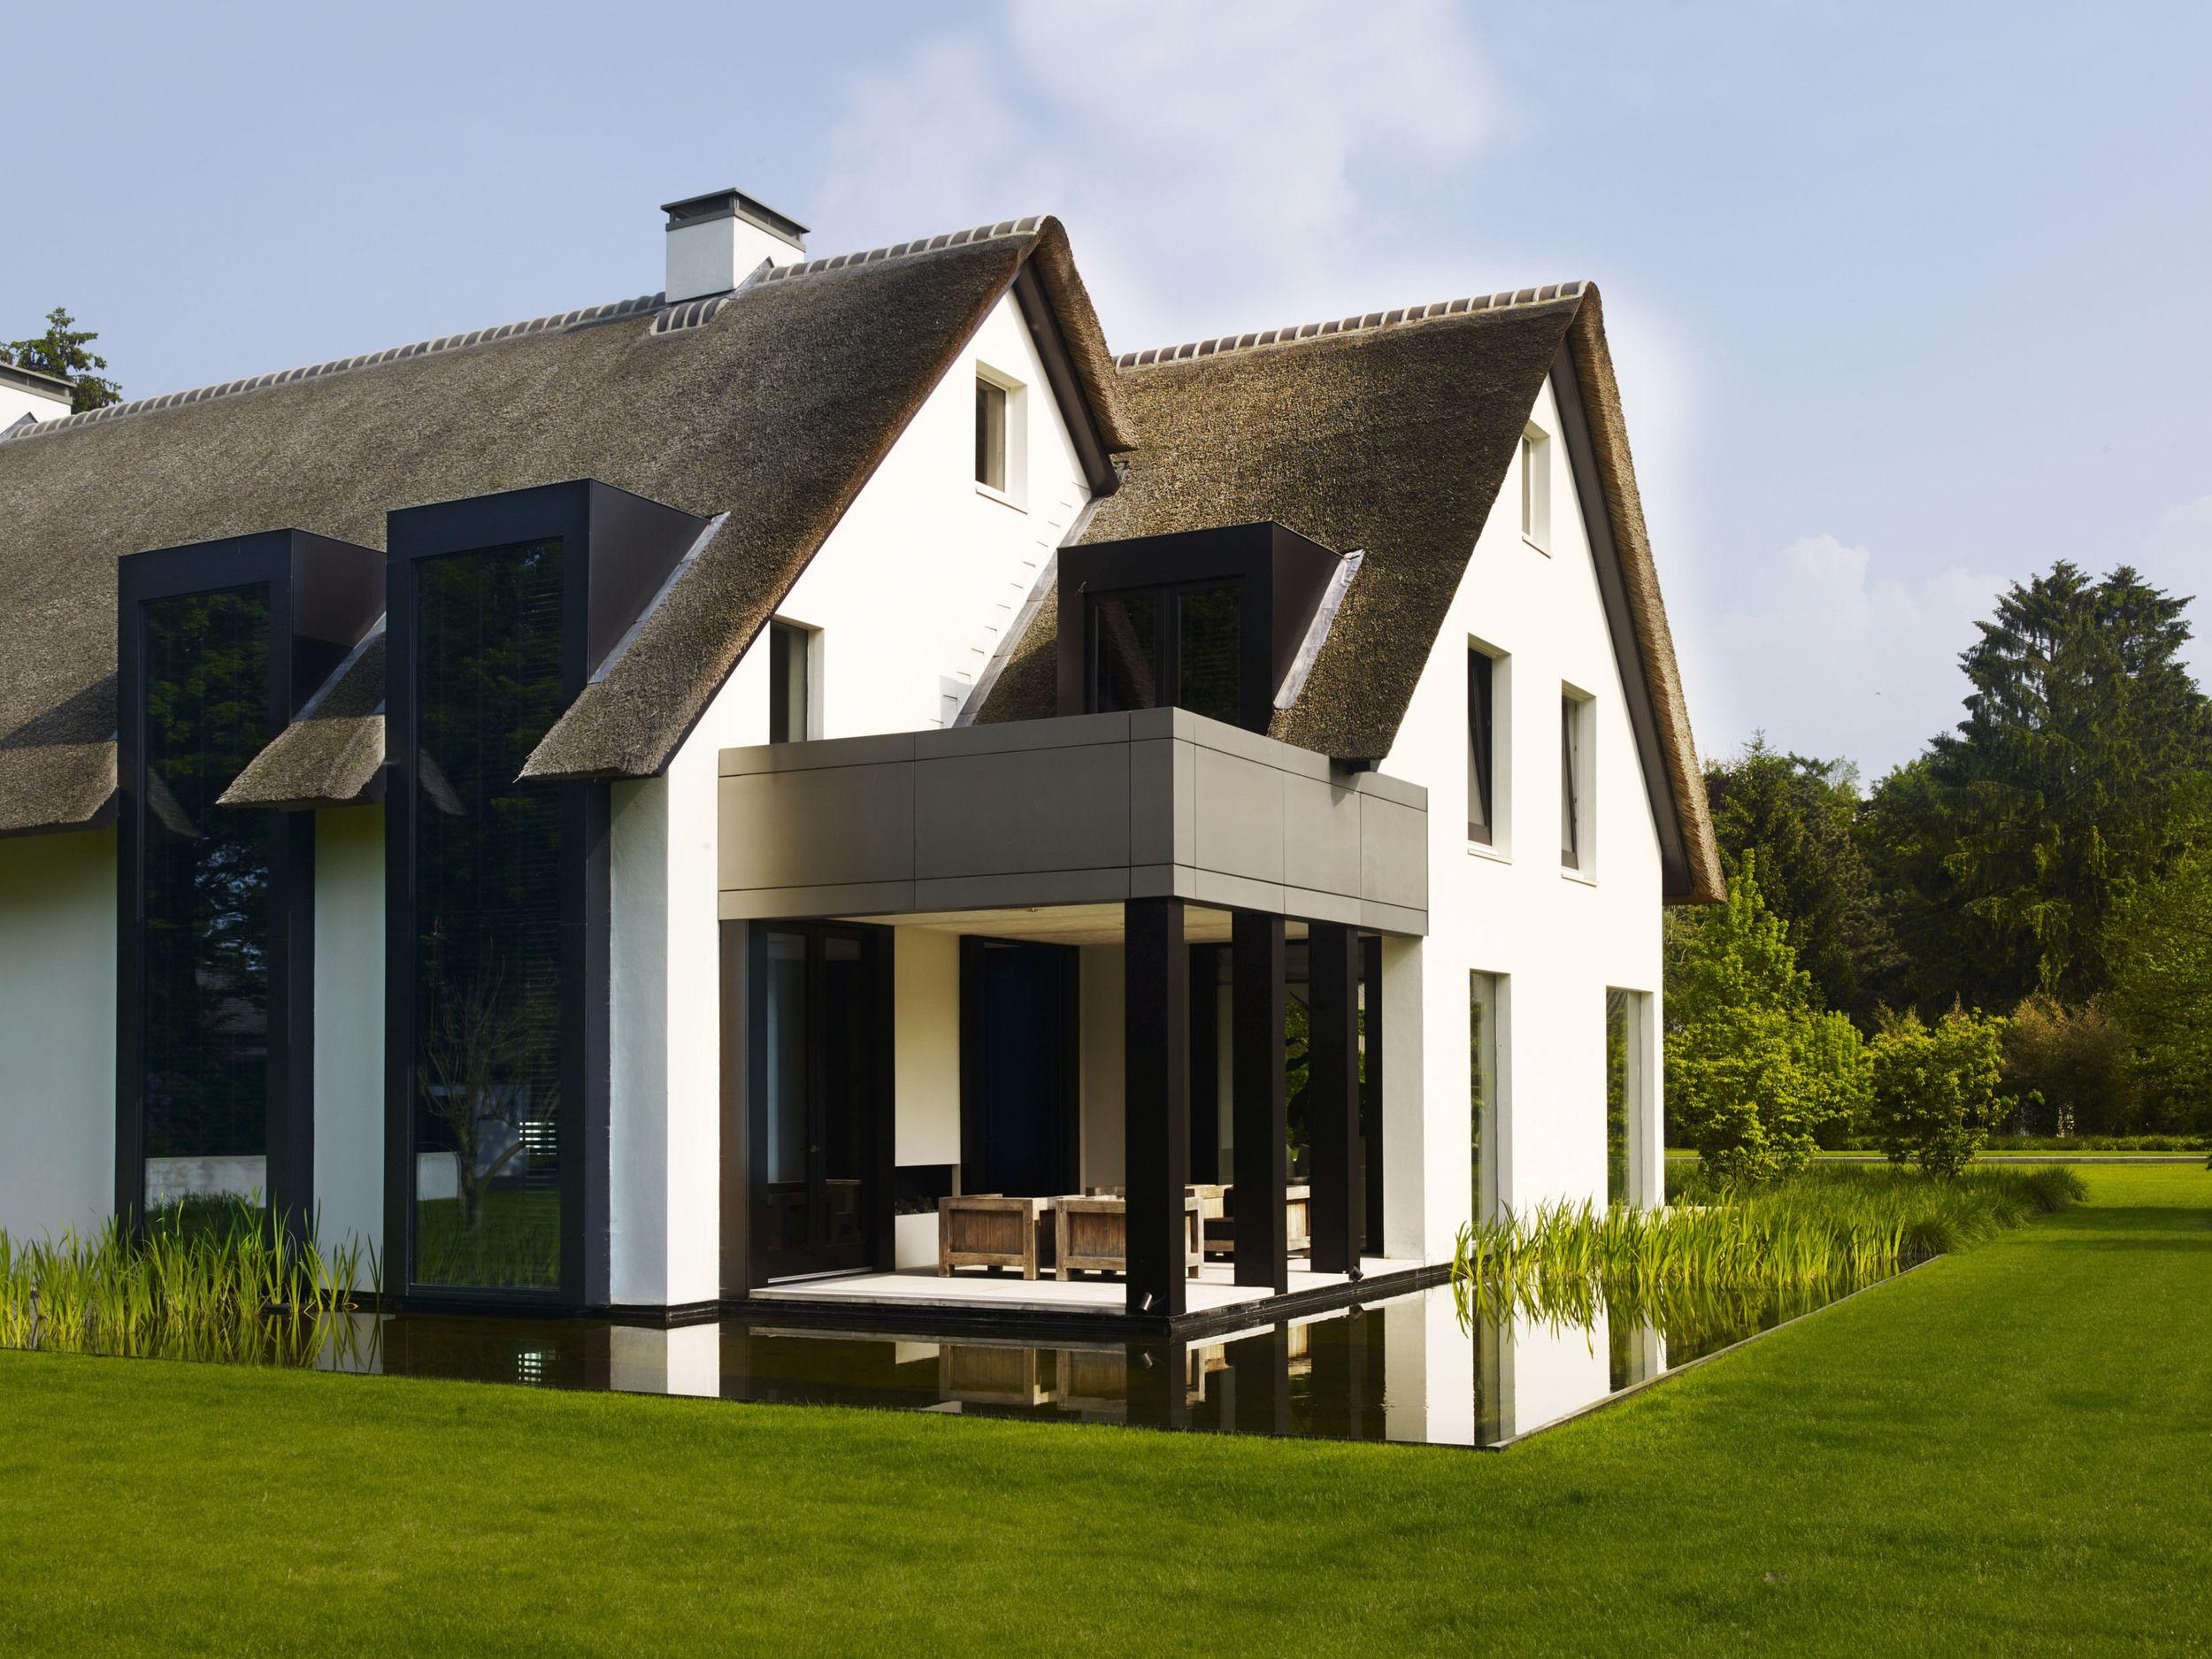 Bob manders architecture u southern woods villa juul lucas